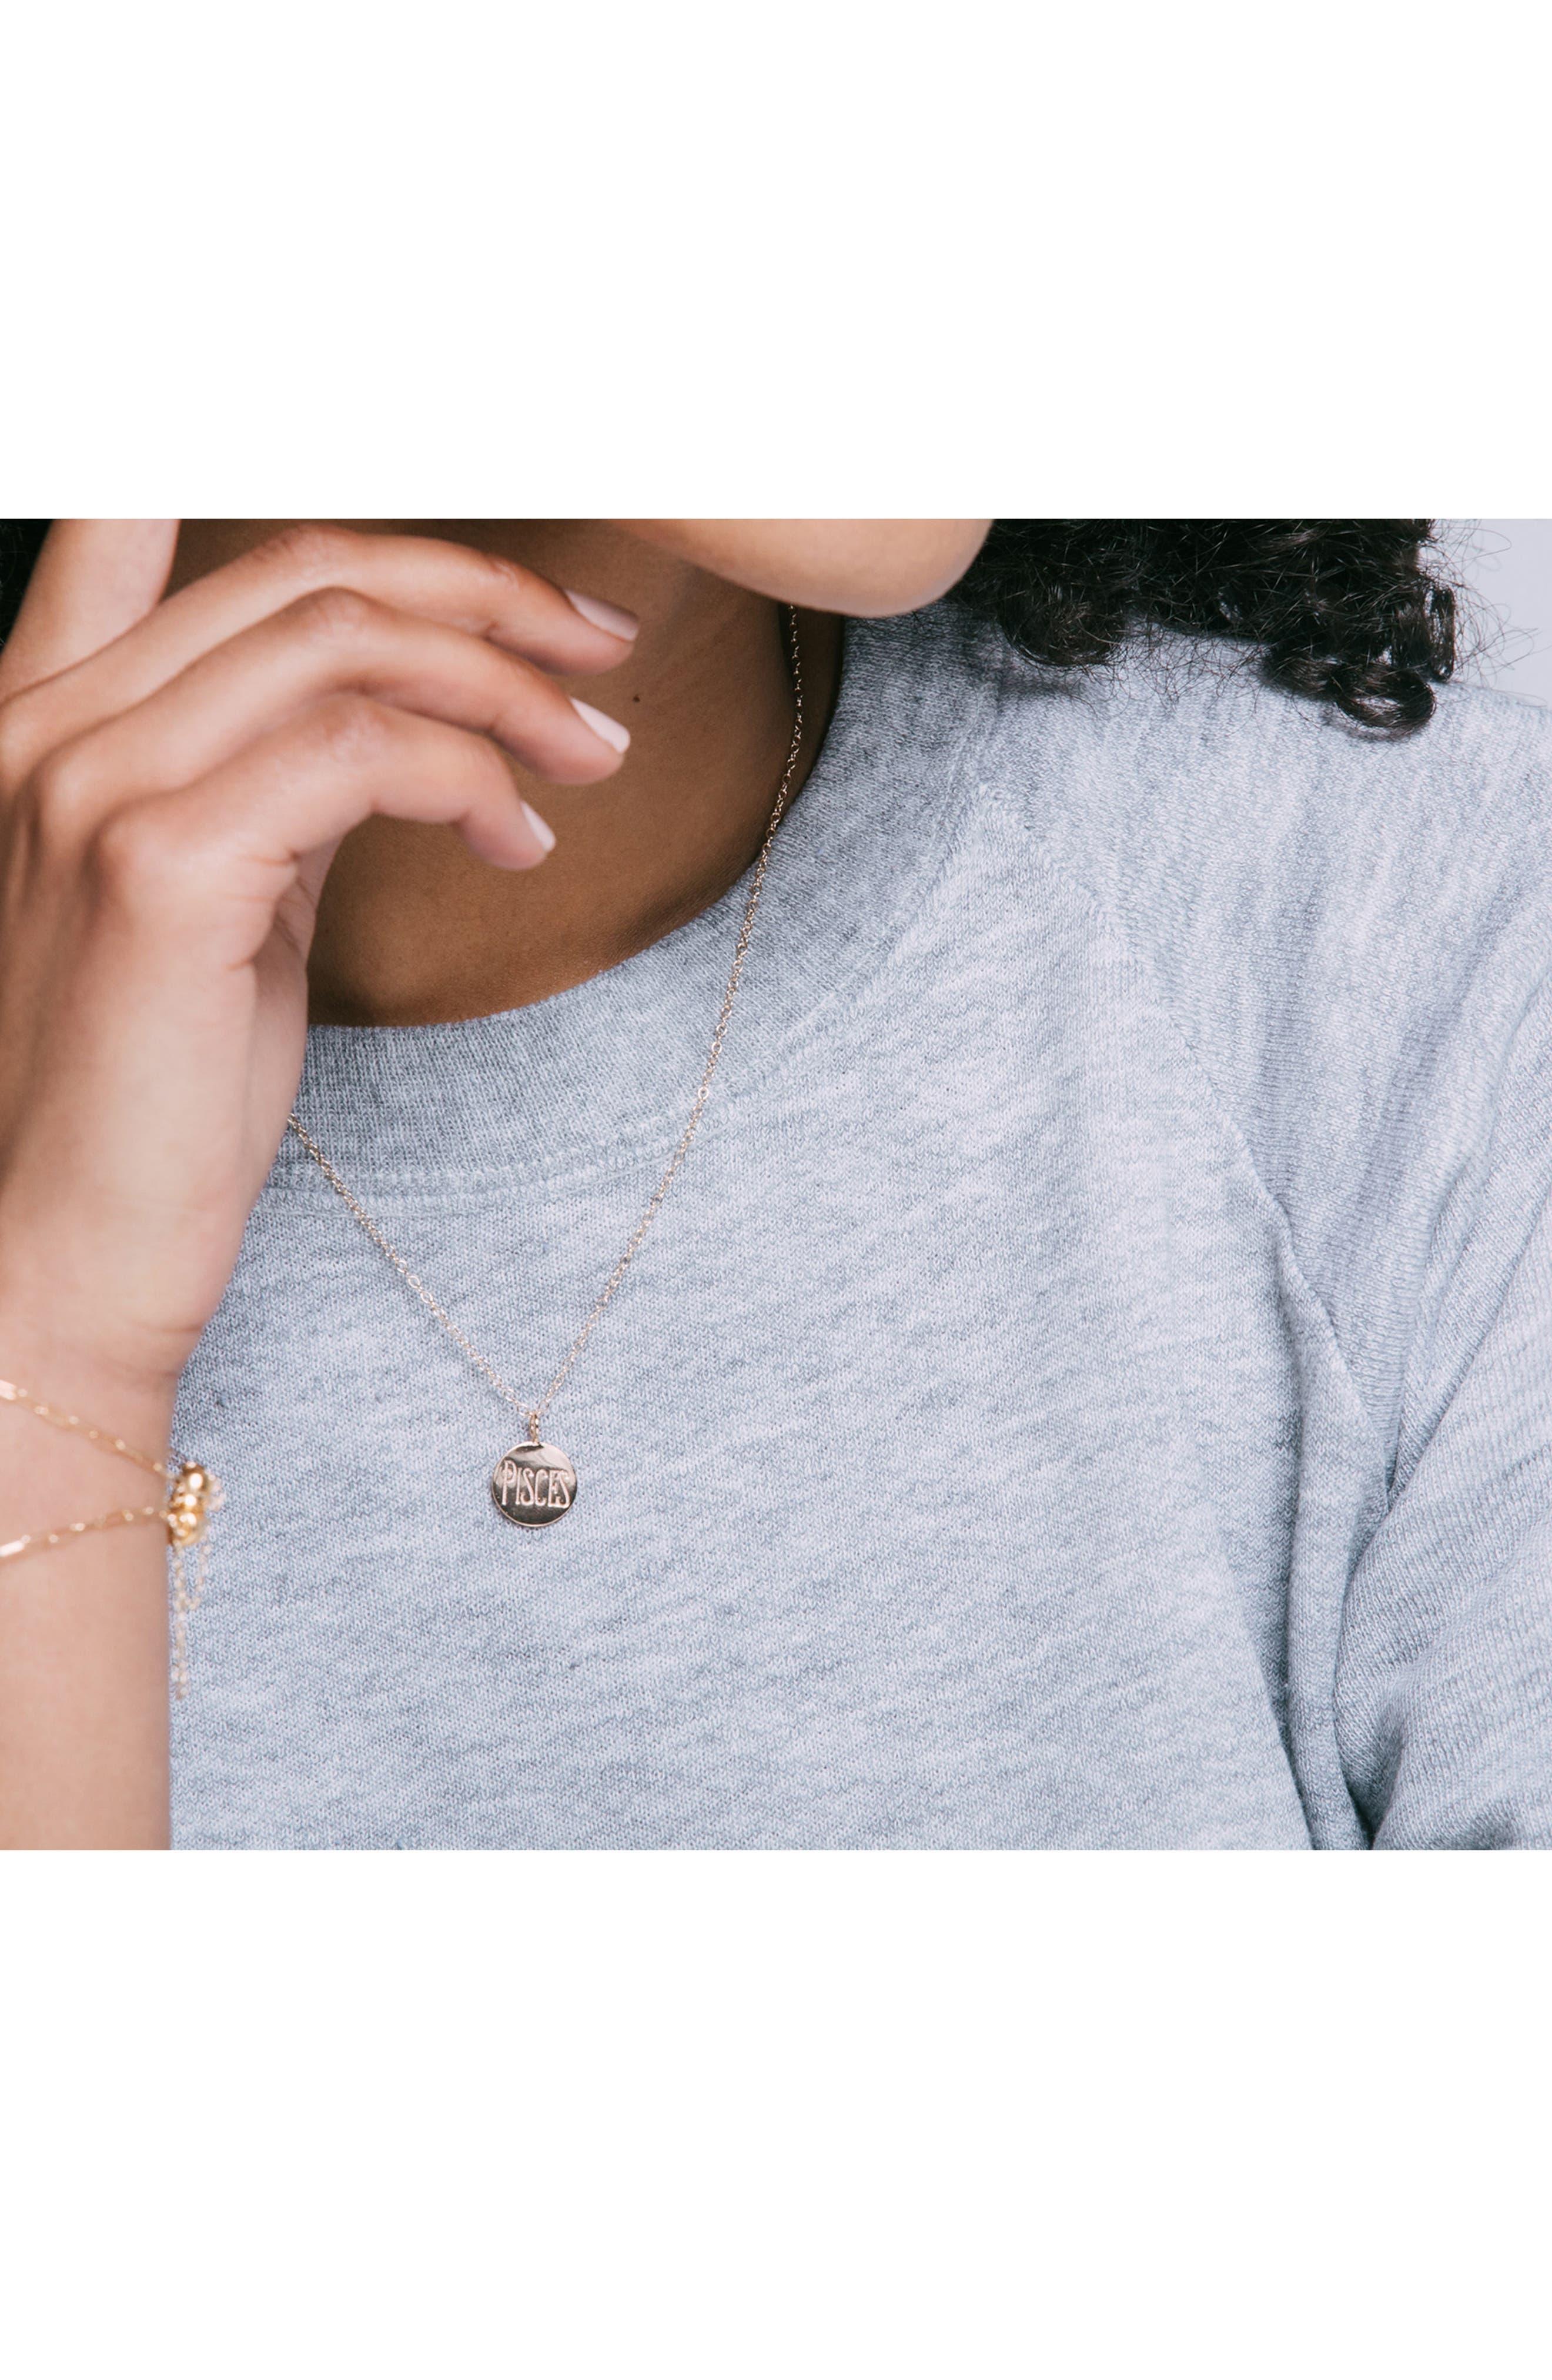 Zodiac Charm Necklace,                             Alternate thumbnail 2, color,                             Taurus - Gold